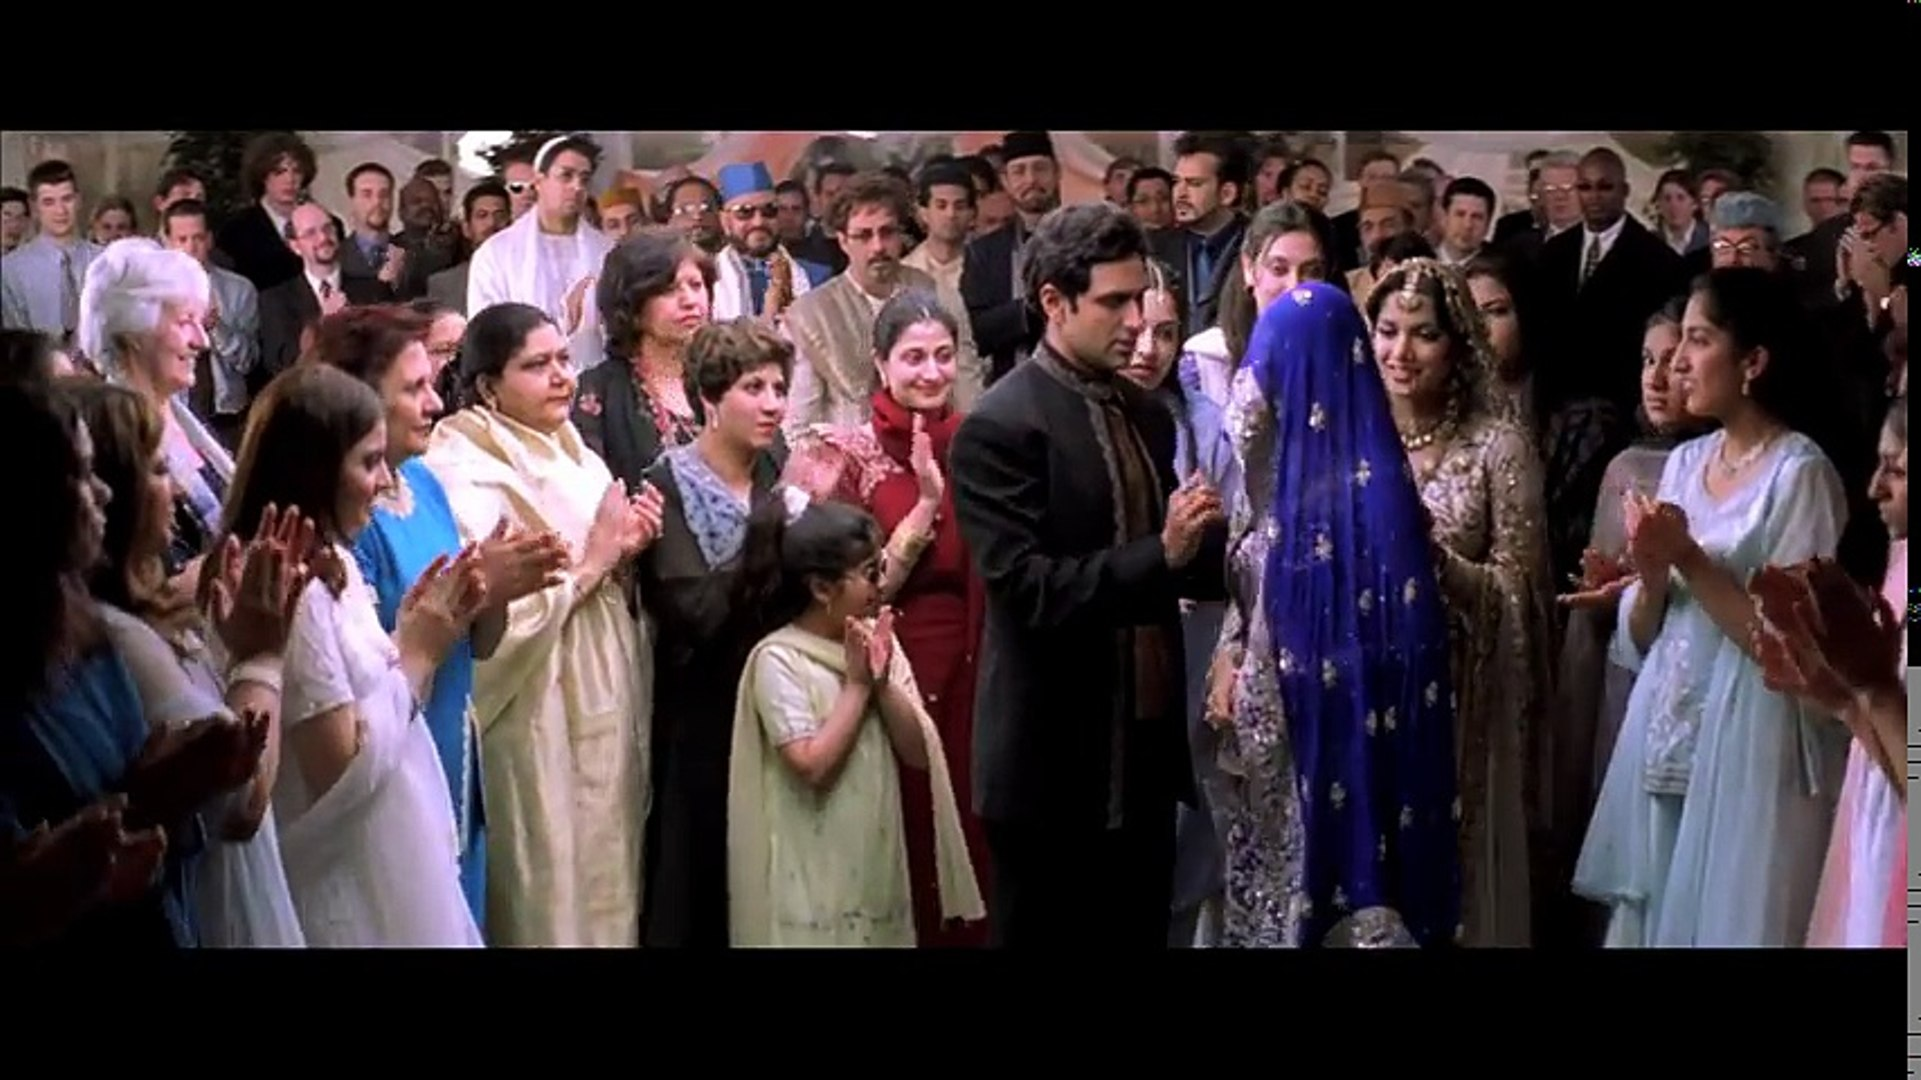 Hindi Movie 2017 - The Hero Full Movie - Hindi Movies 2017 Full Movie - Hindi Movies - Sunny Deol Fu